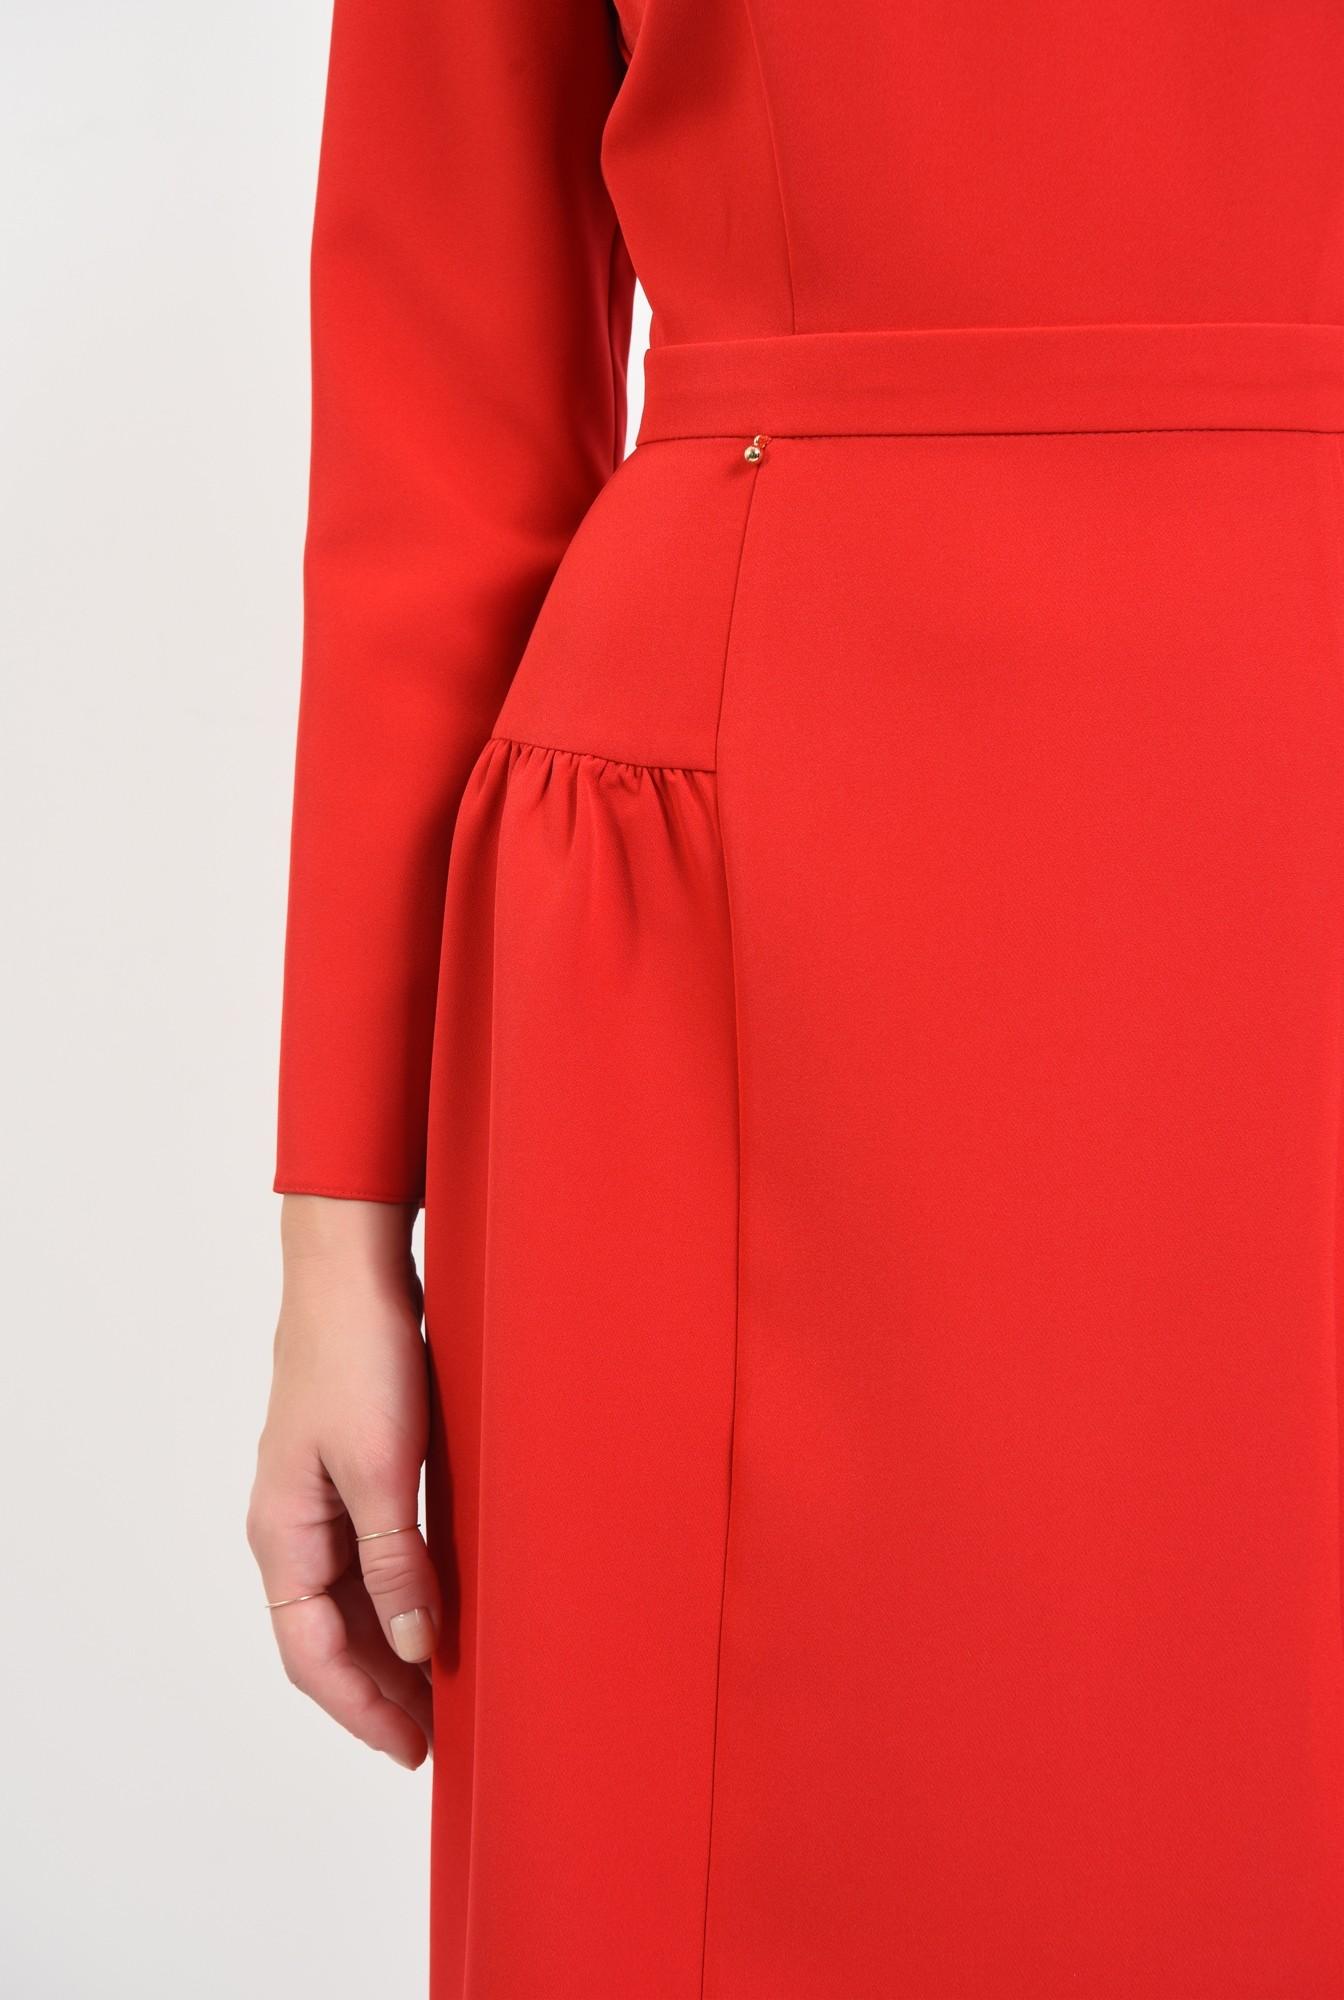 2 - rochii de dama online, betelie, croi evazat, inchidere cu fermoar